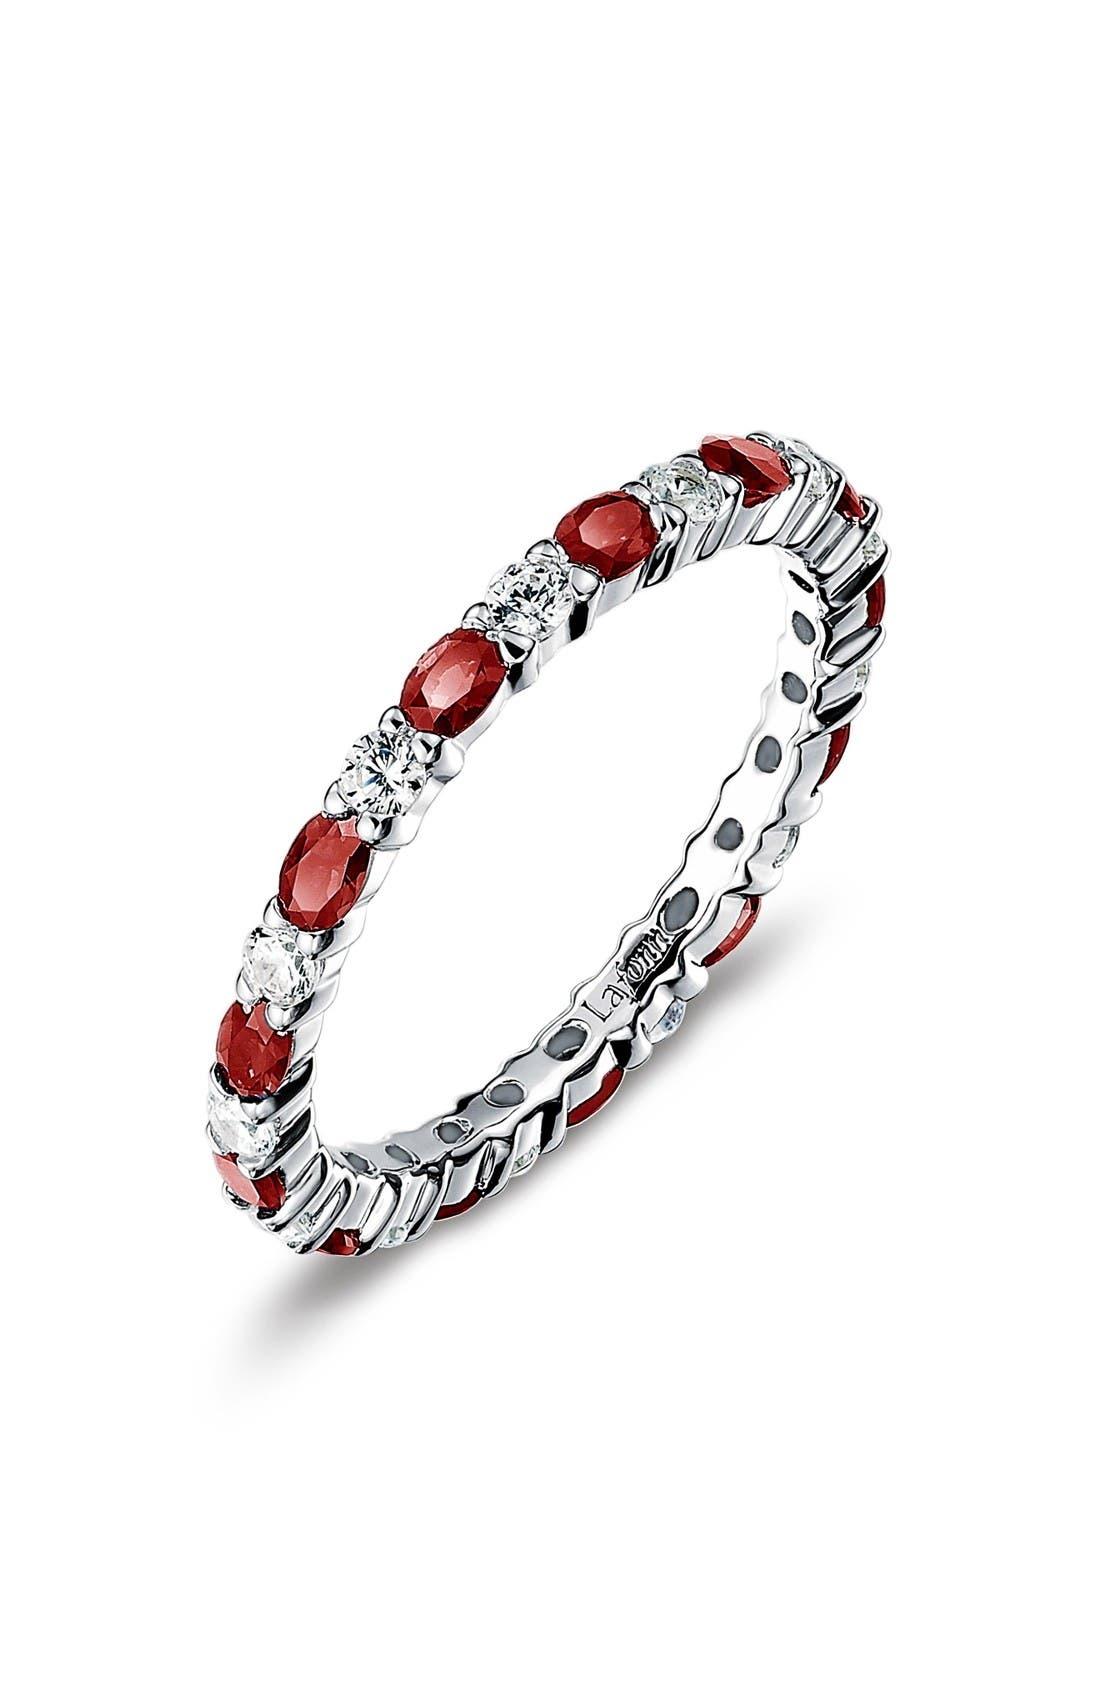 Simulated Diamond Birthstone Band Ring,                             Main thumbnail 1, color,                             January / Garnet